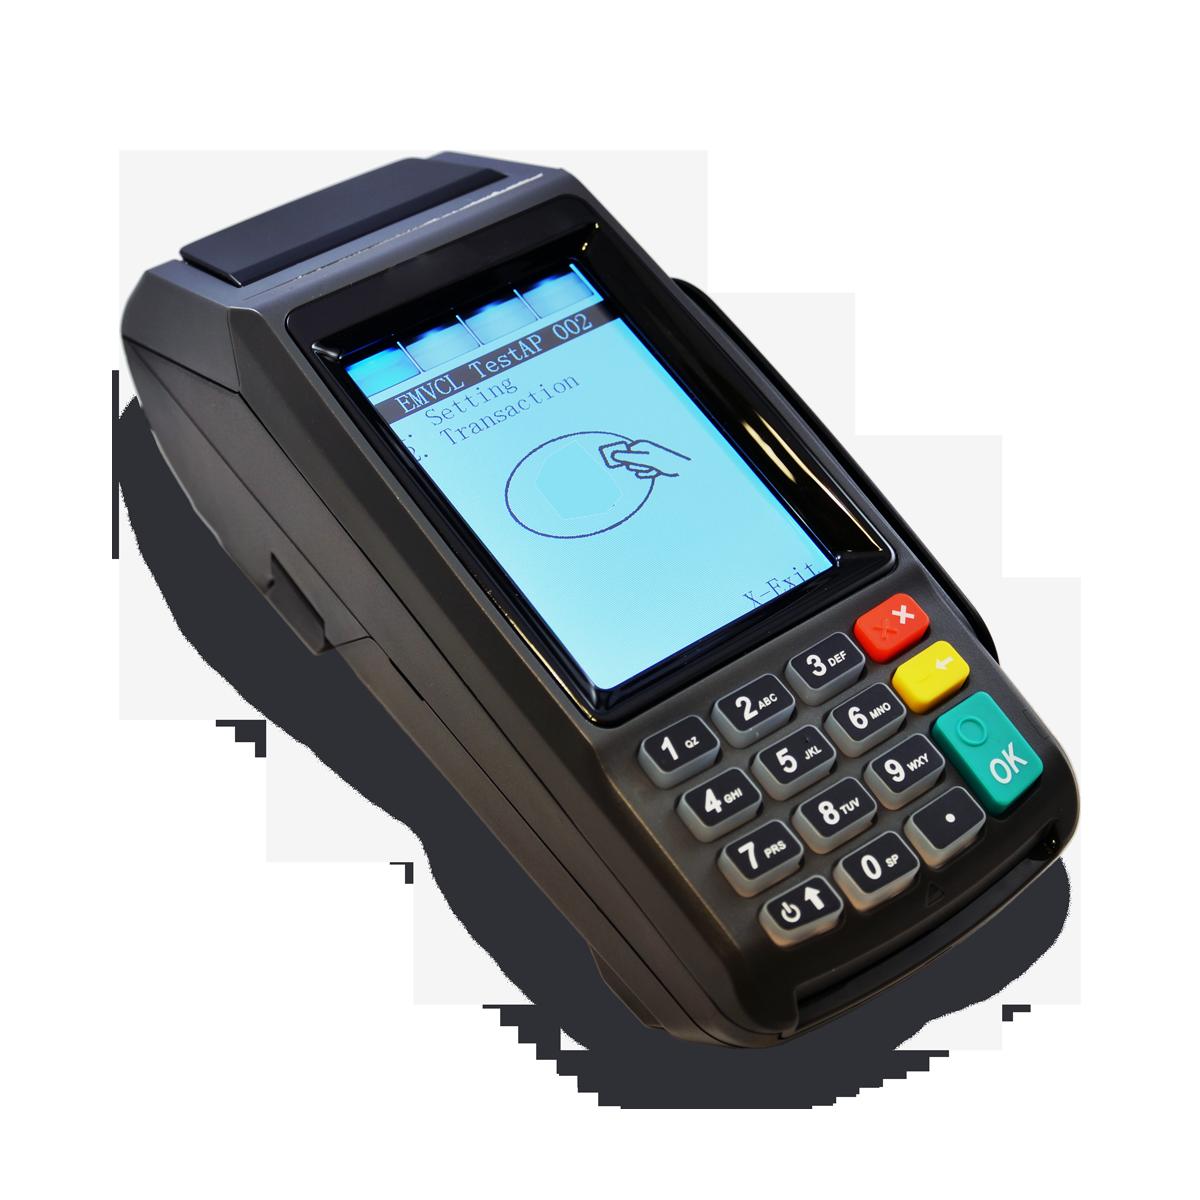 NFC Terminals